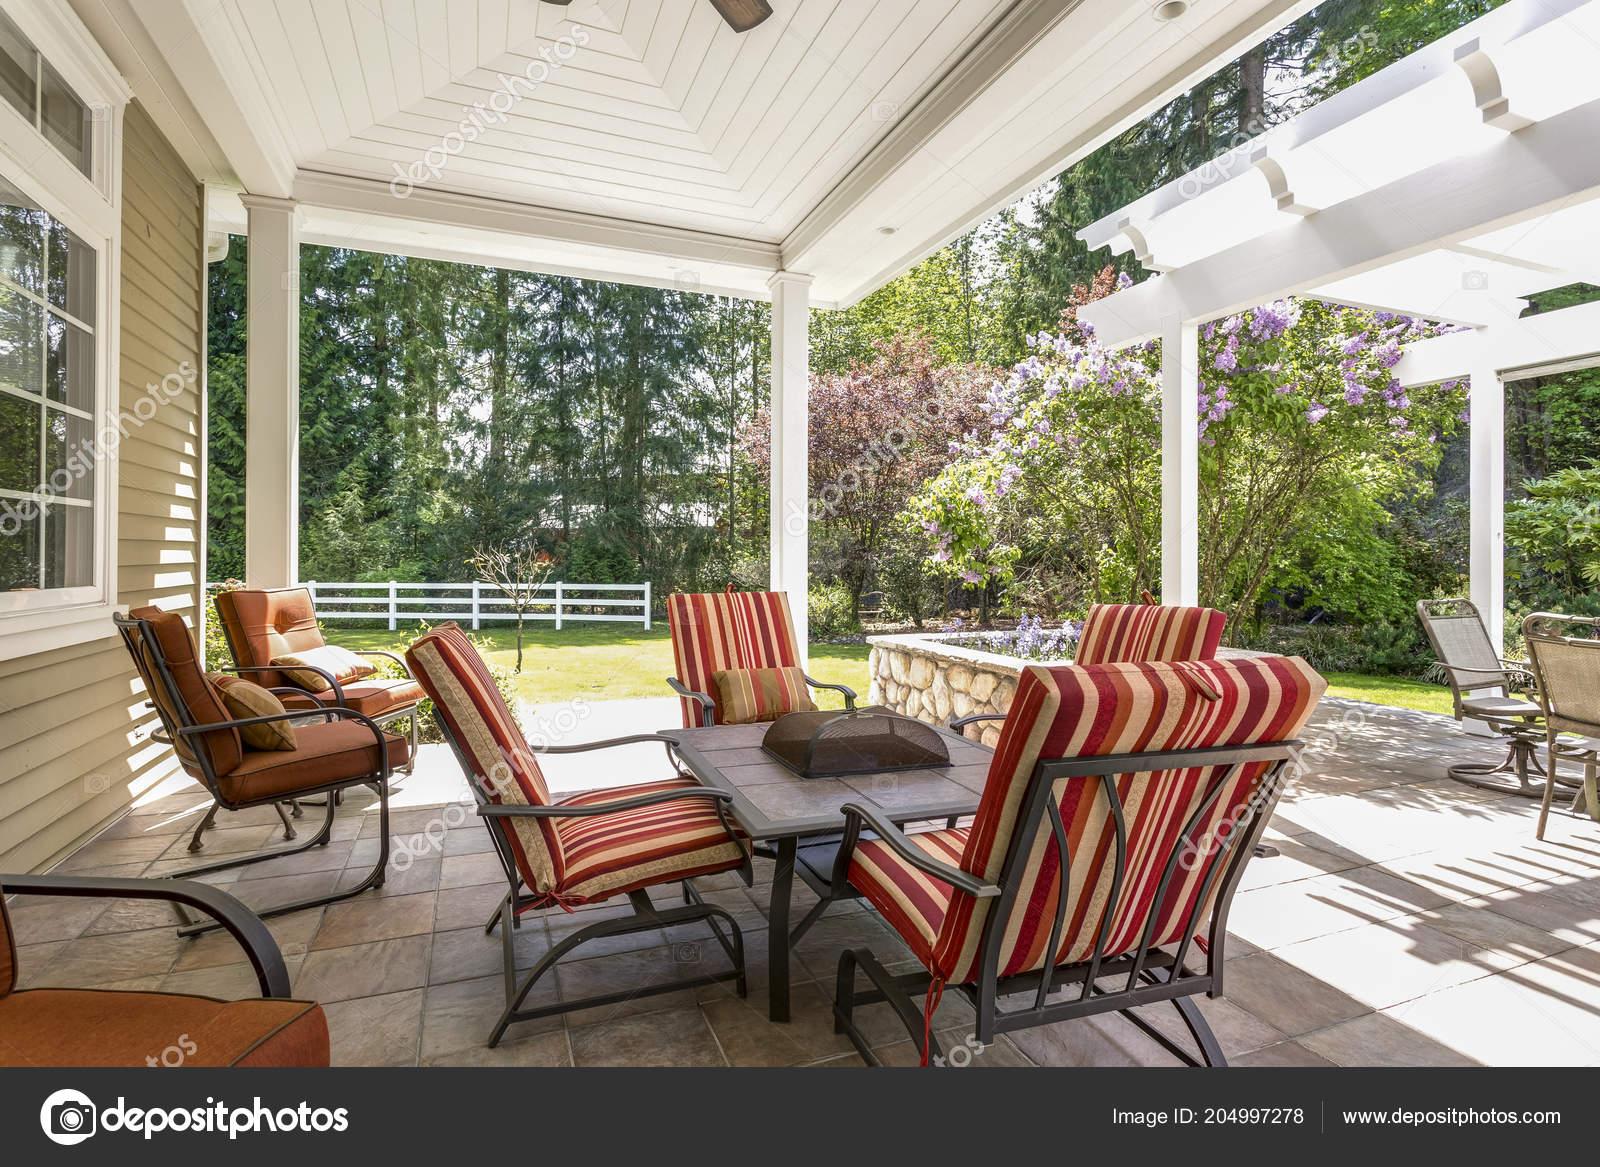 https depositphotos com 204997278 stock photo spacious covered deck area table html